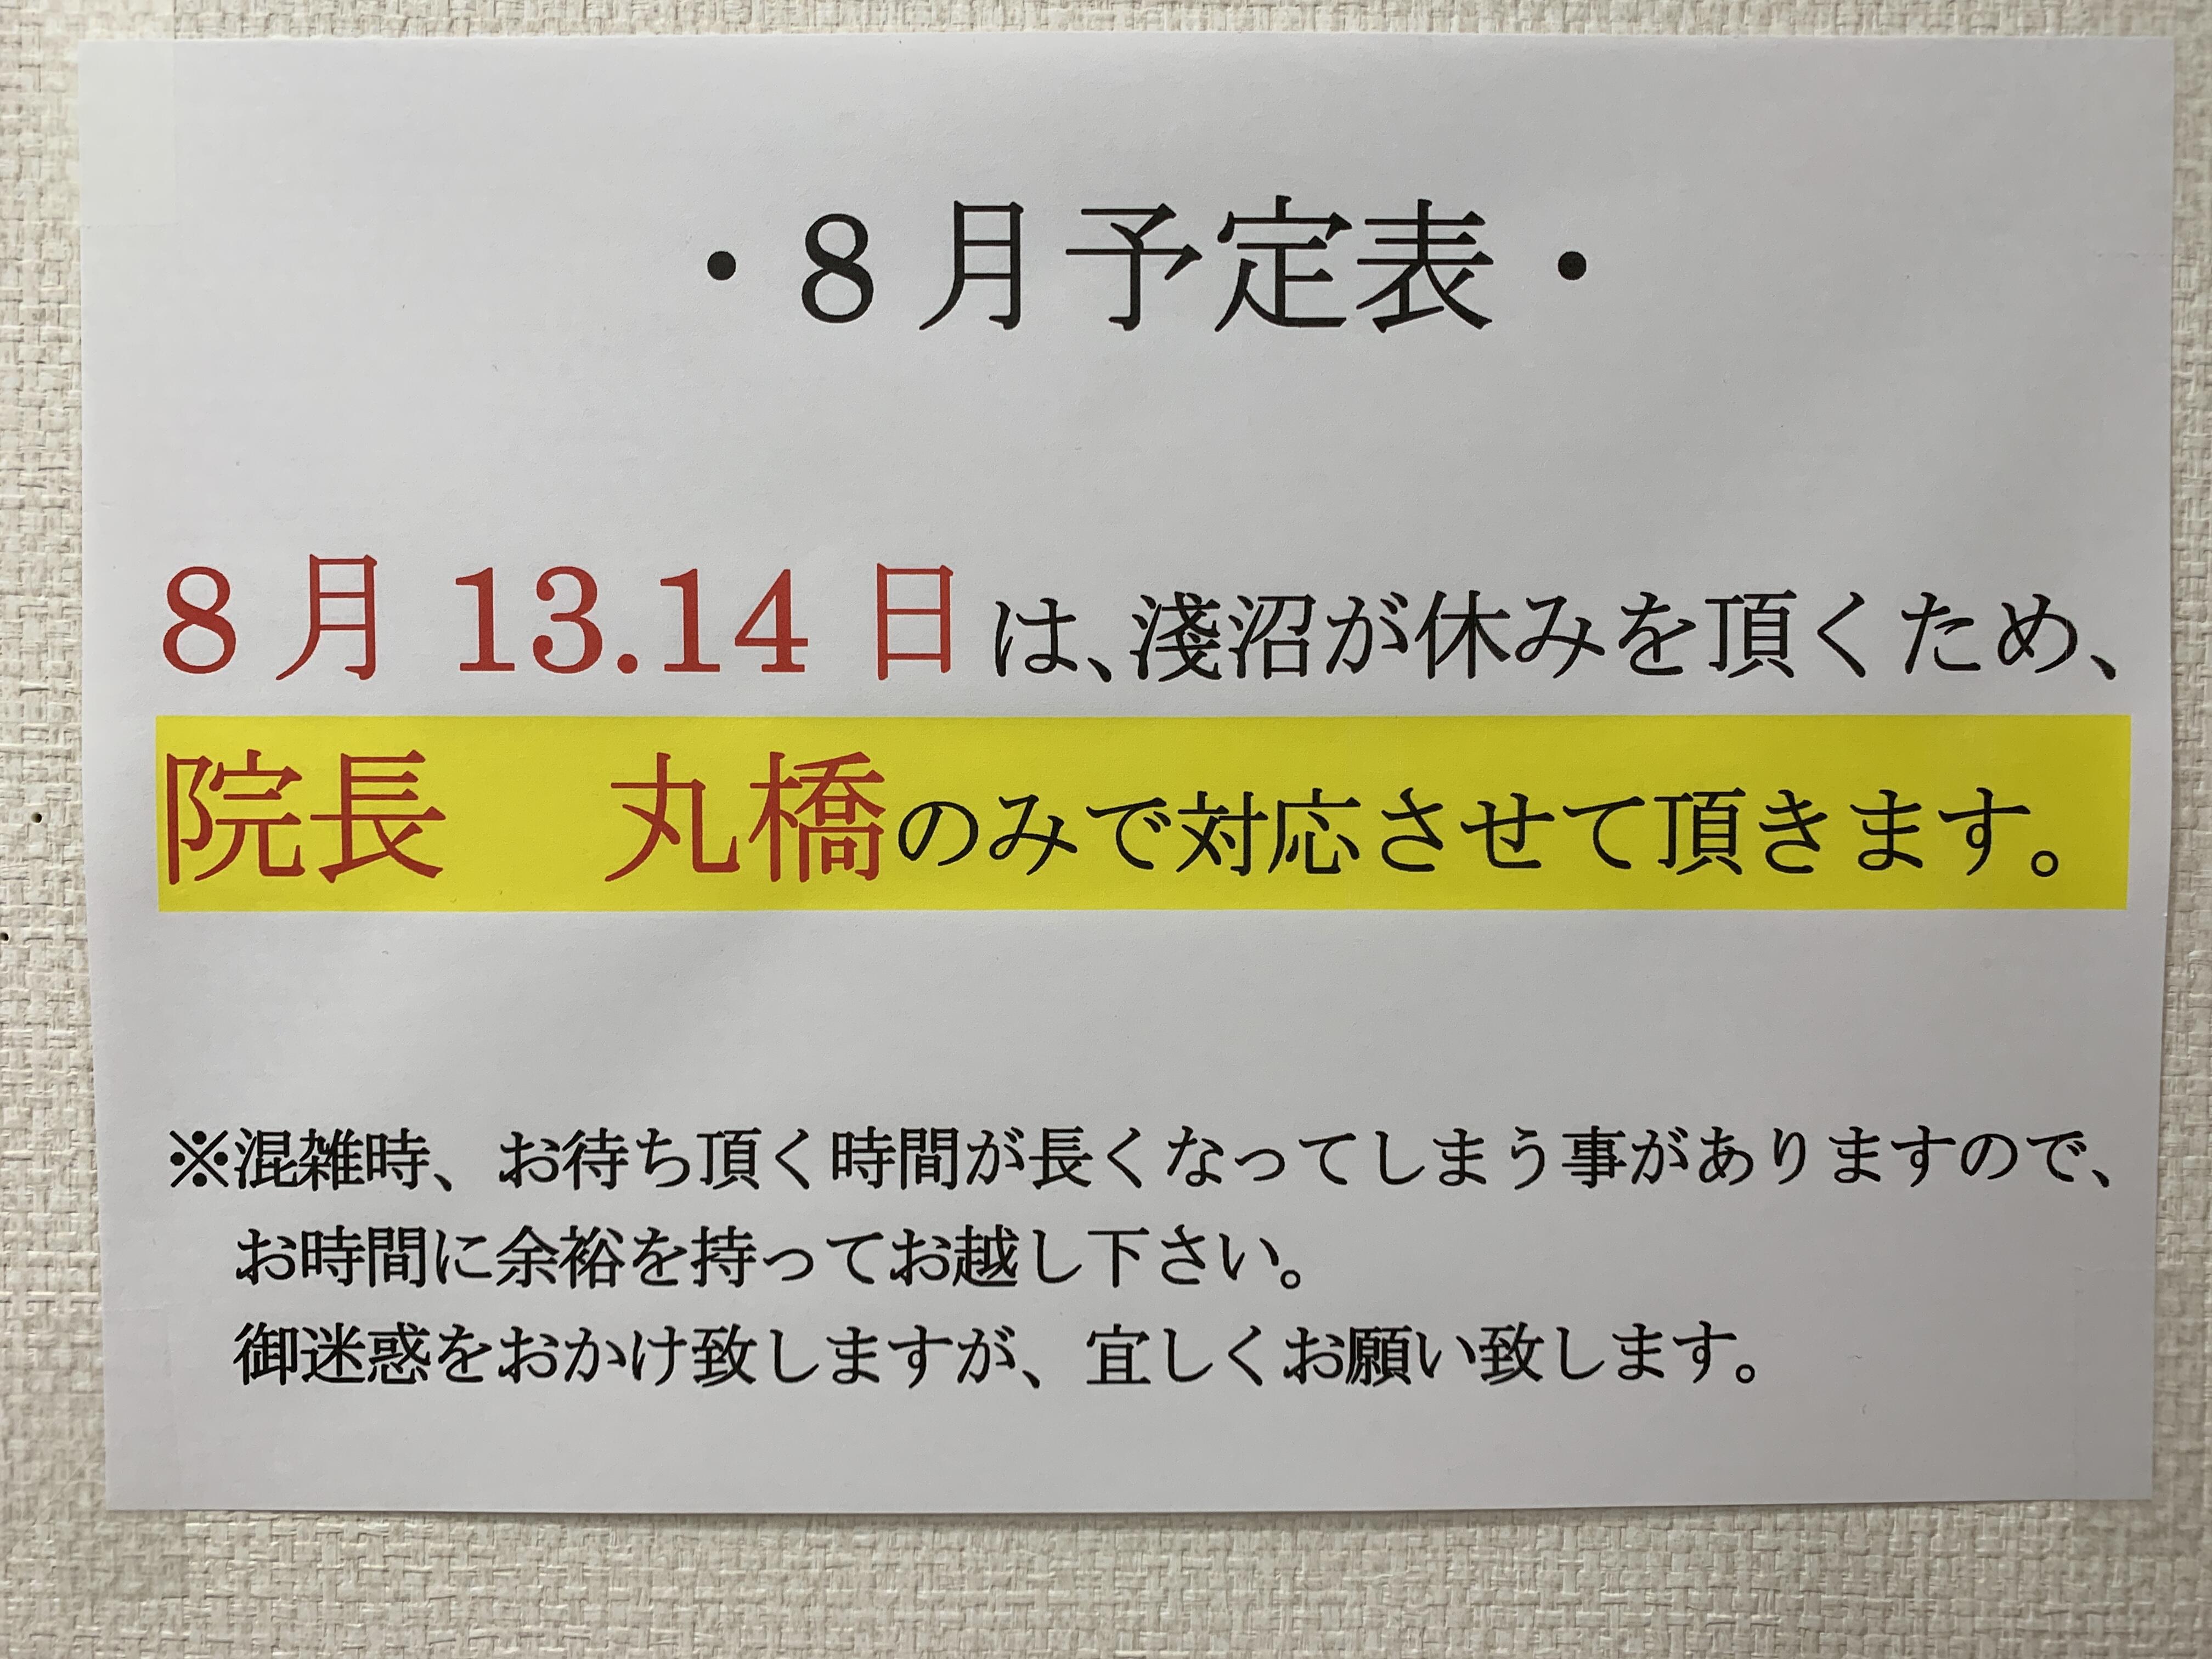 https://maru84.com/update/up-img/IMG_6522.JPG